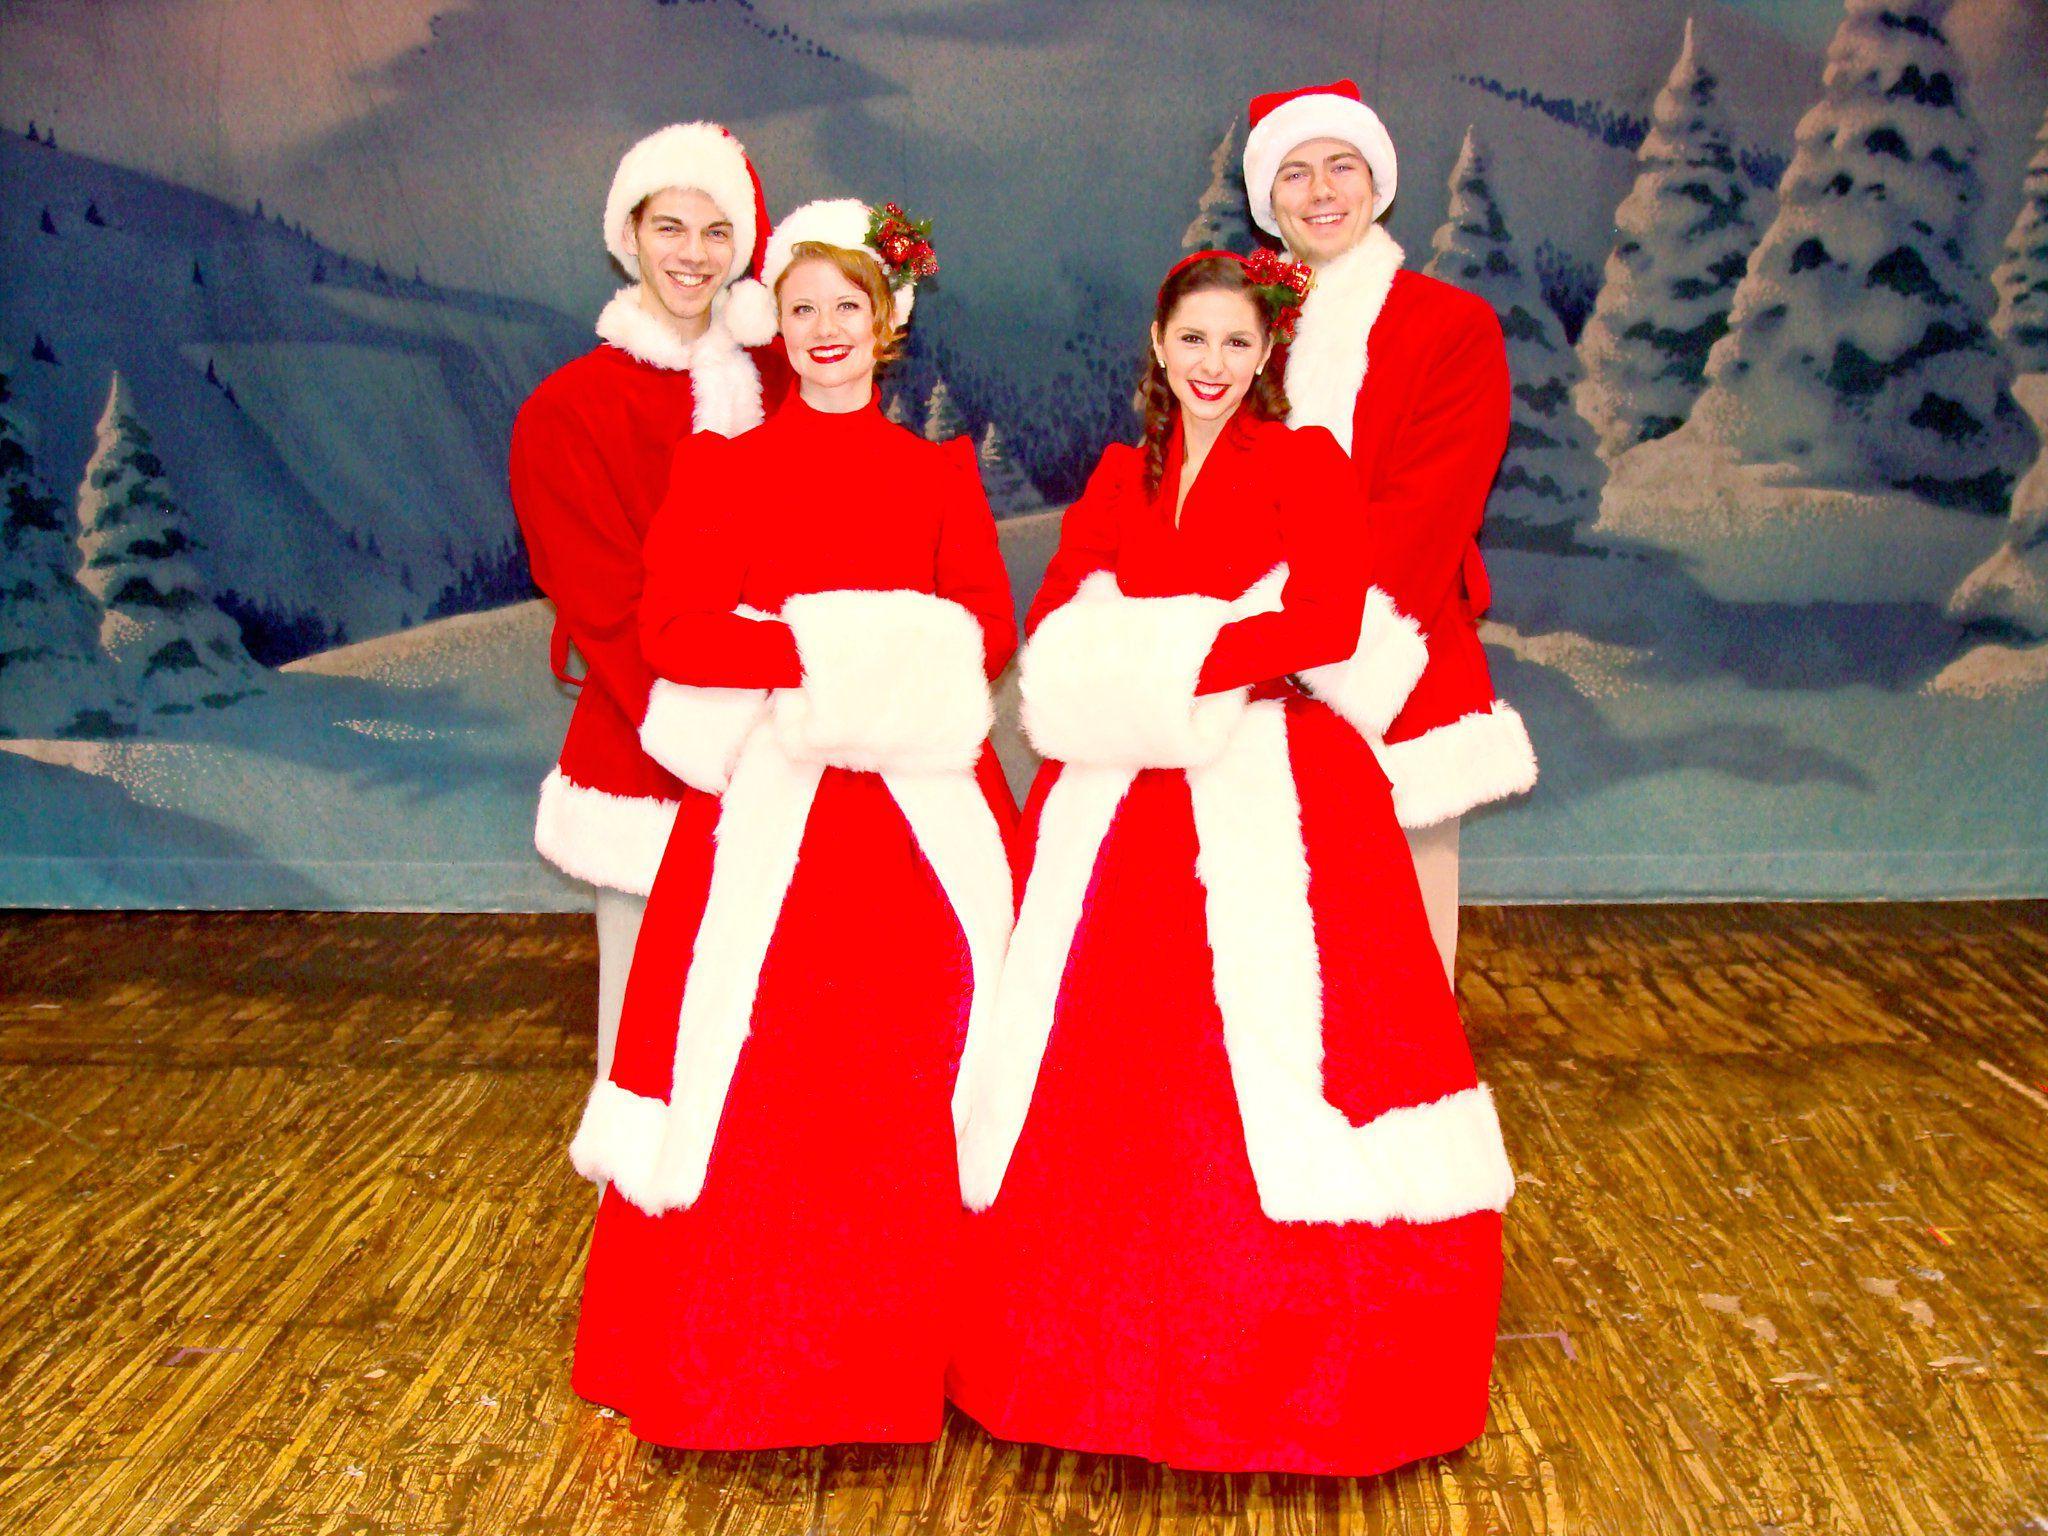 La Comedia presents holiday classic 'White Christmas'